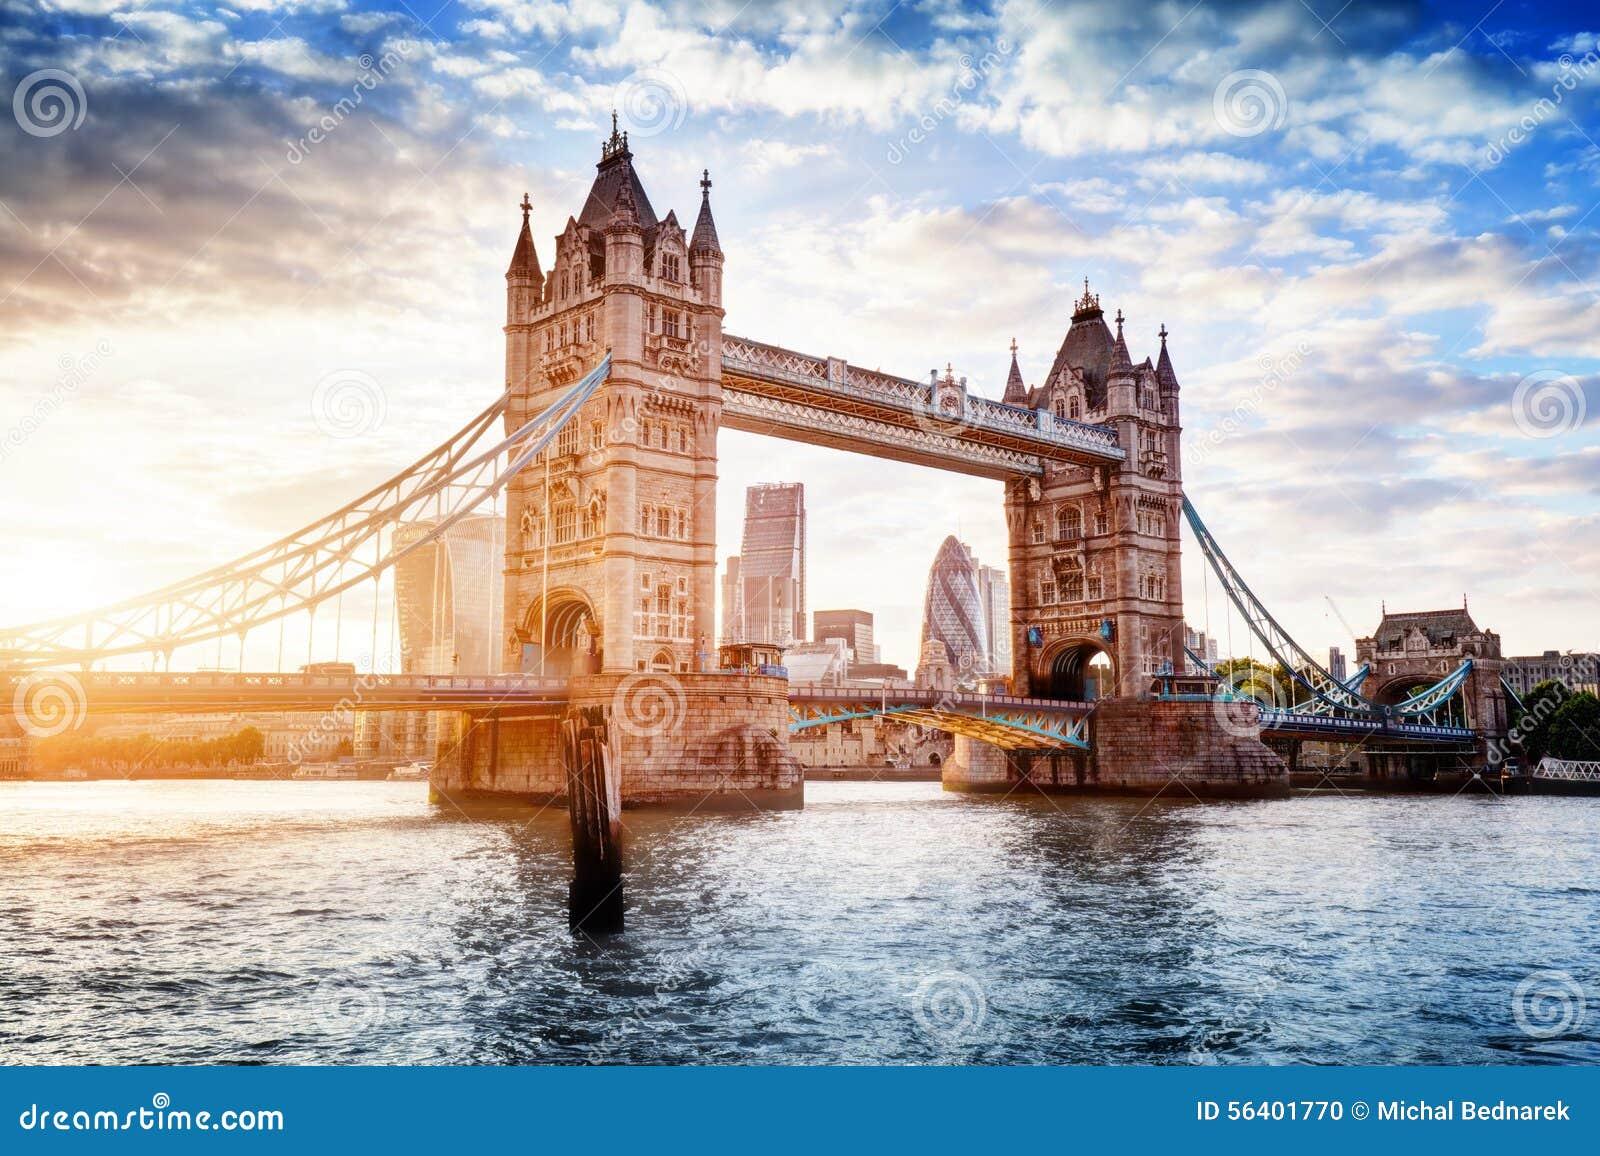 Turm-Brücke in London, Großbritannien bei Sonnenuntergang Zugbrückeöffnung